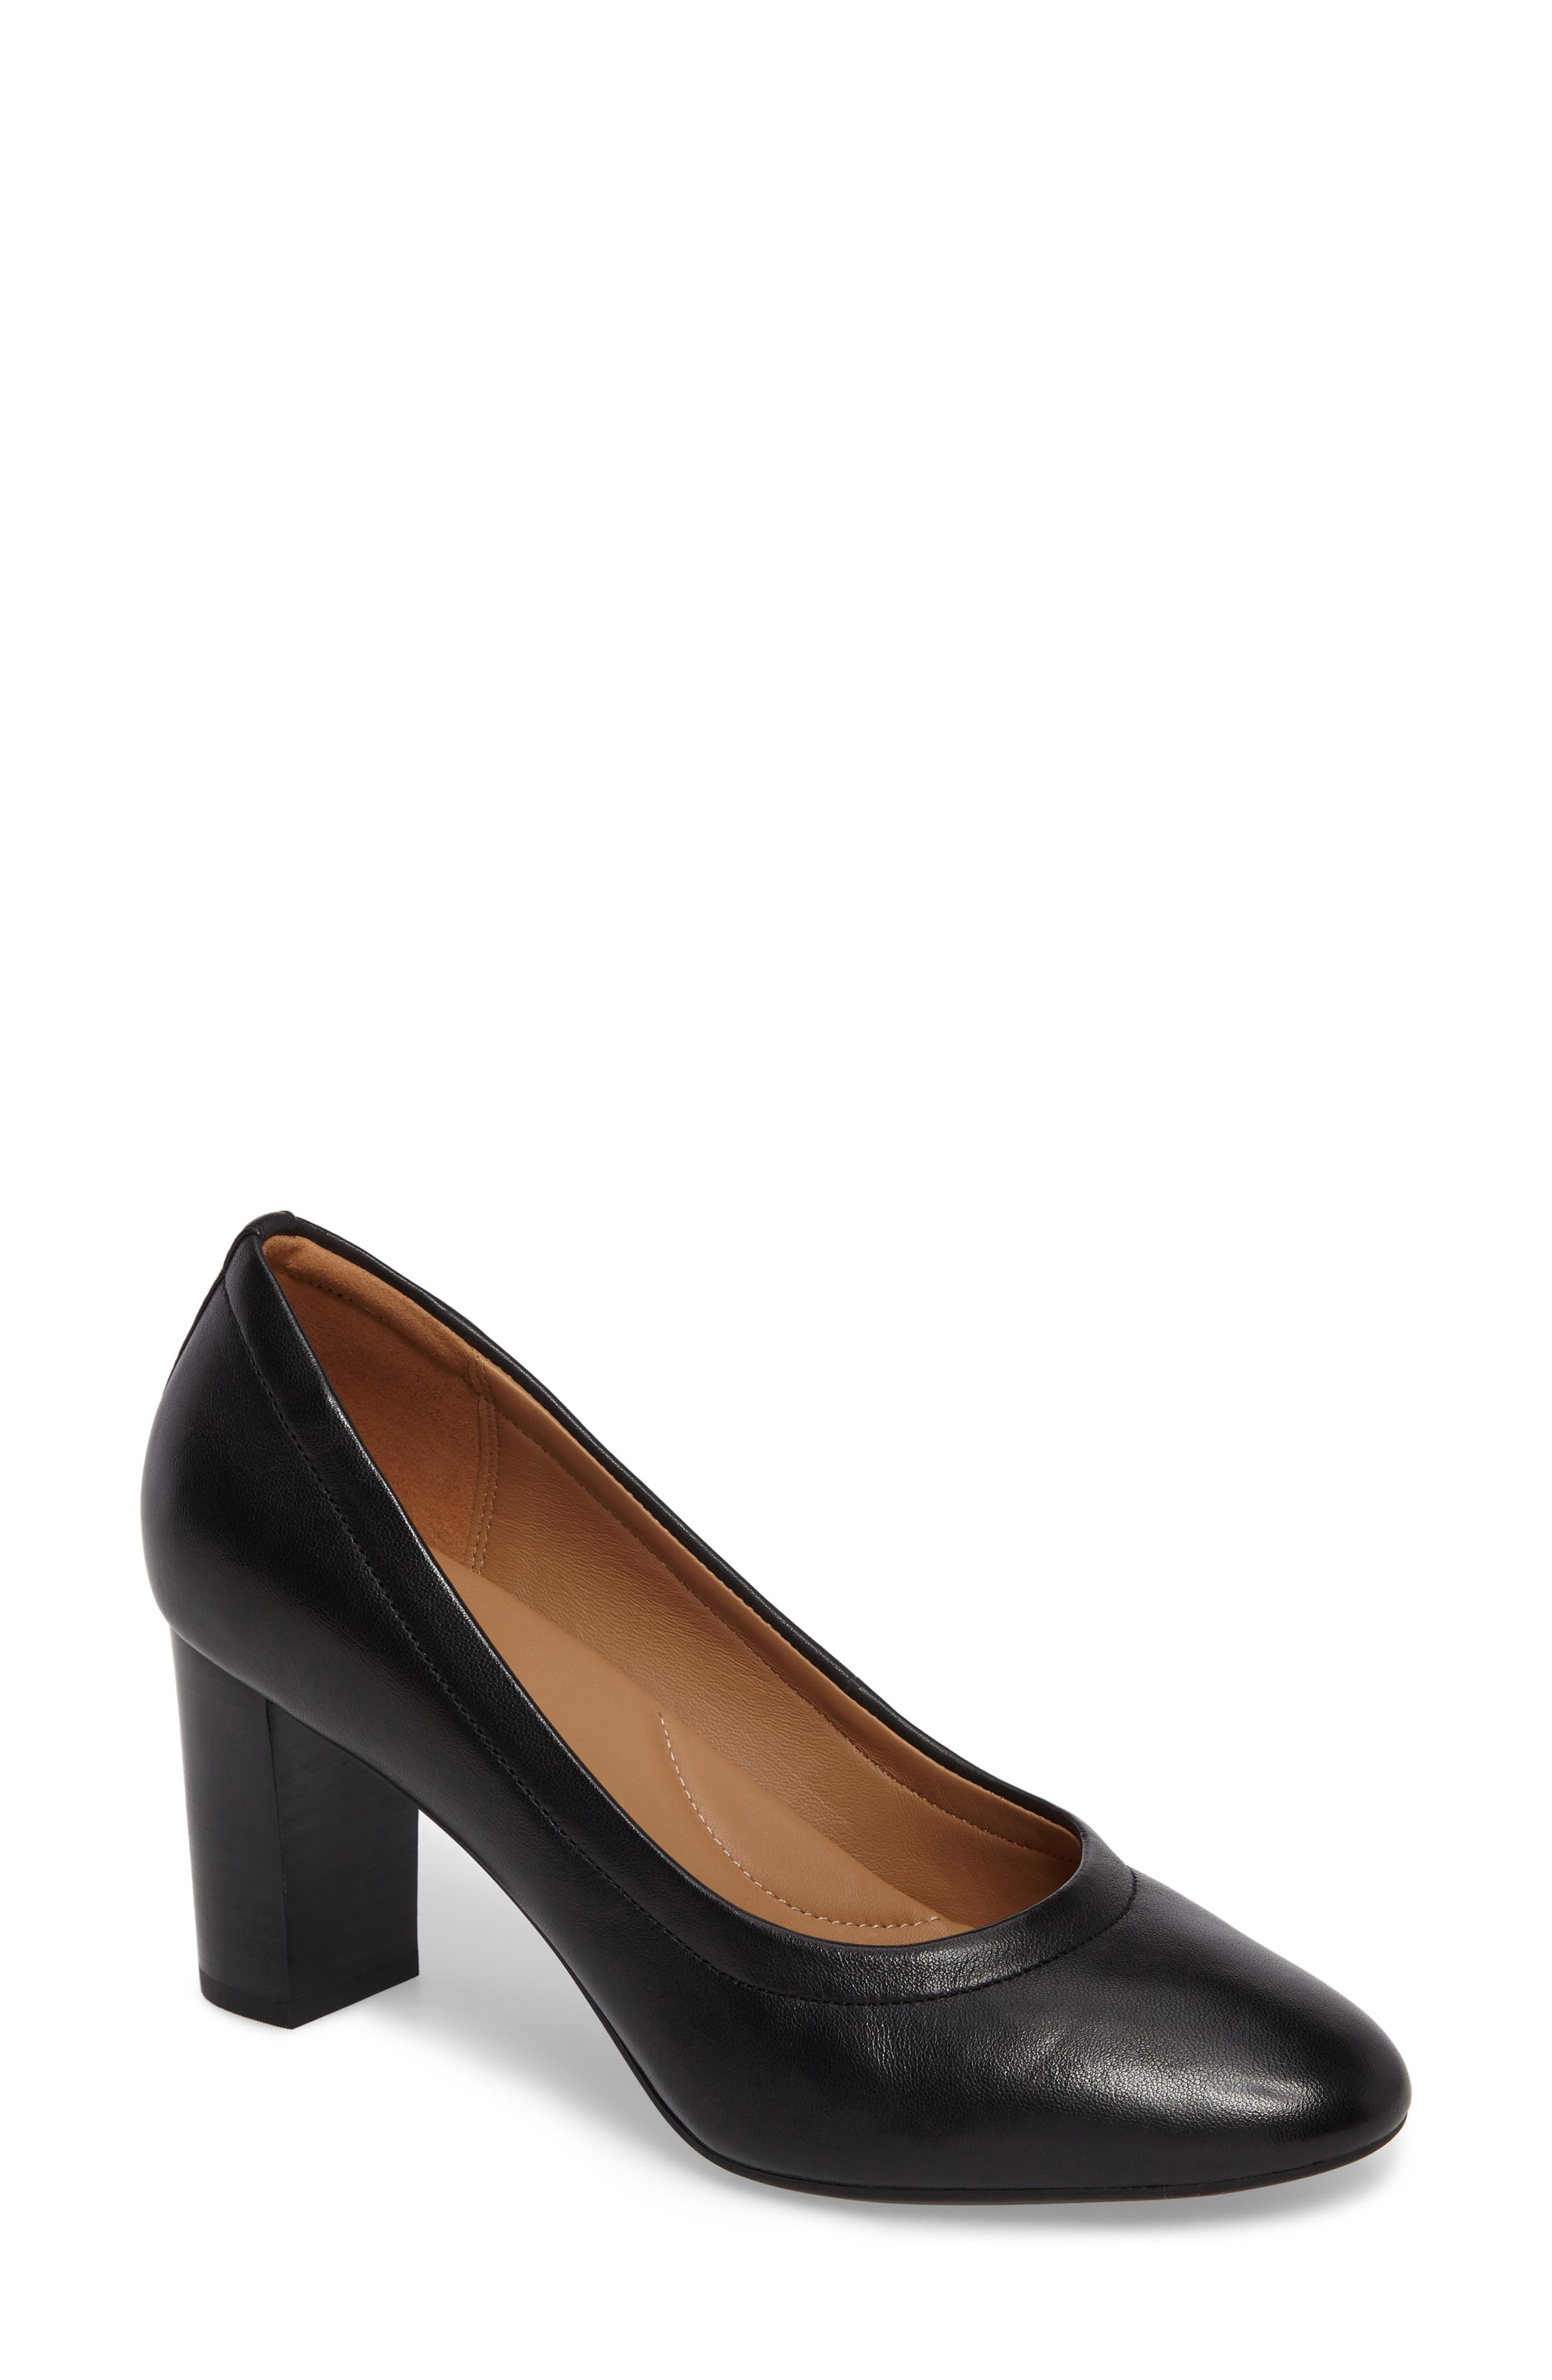 Chryssa Ari Pump,                         Main,                         color, Black Leather